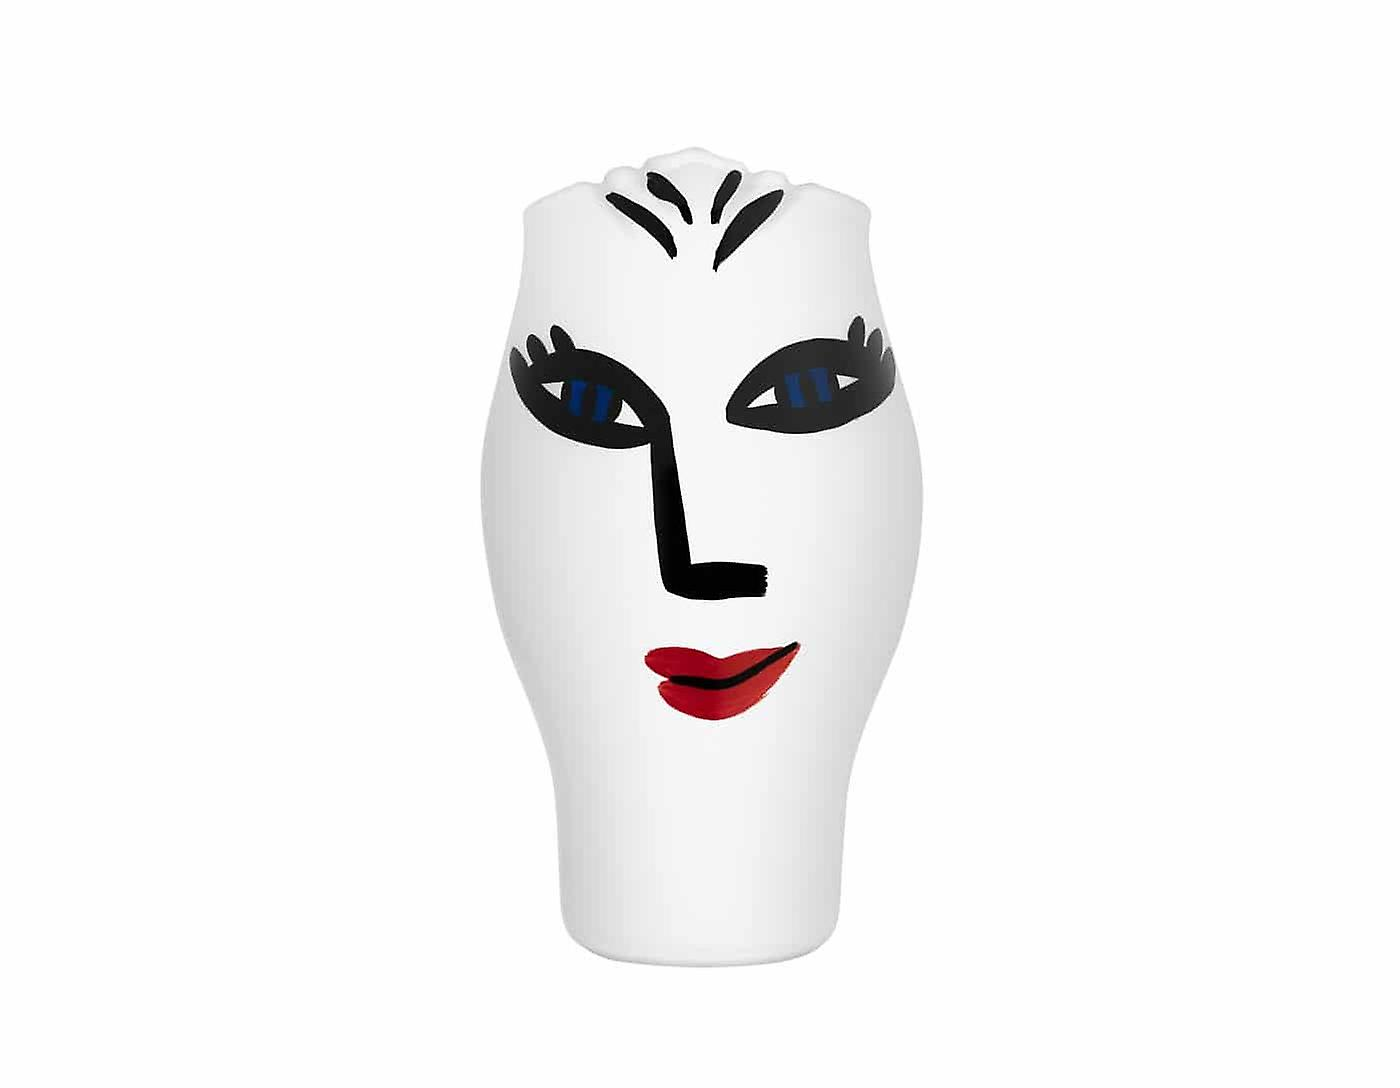 Kosta Boda-Open Minds-white vase Design Ulrica Hydman Vallien